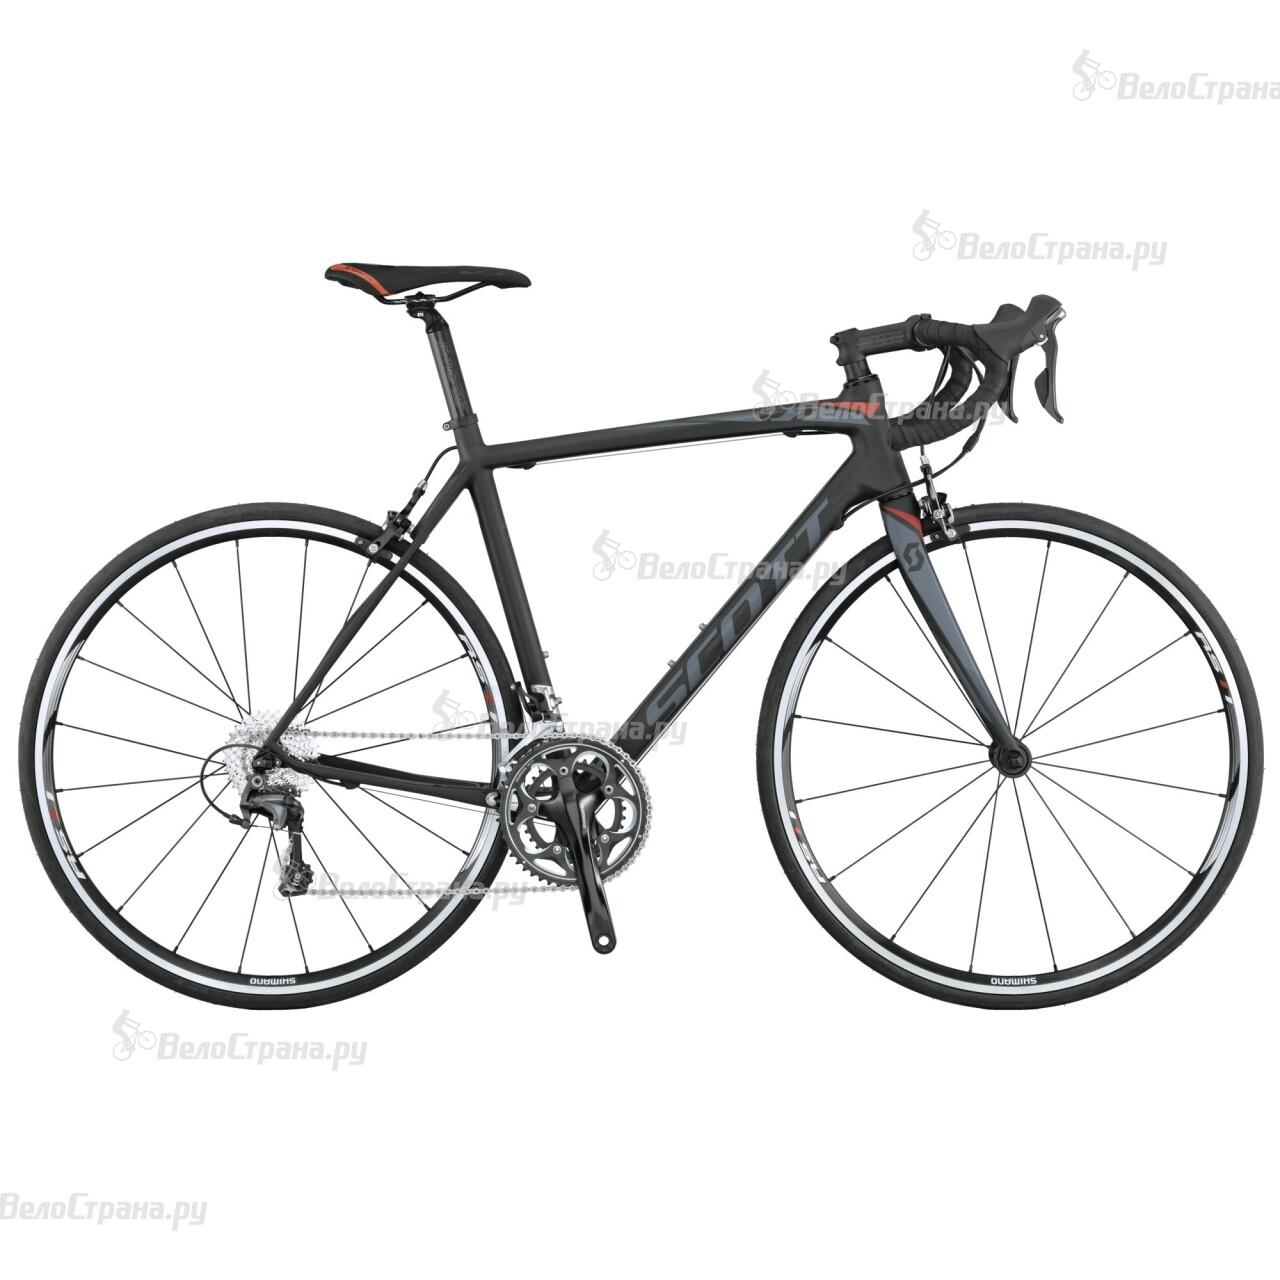 Велосипед Scott CR1 10 (2015) прочие устройства sonance cr1